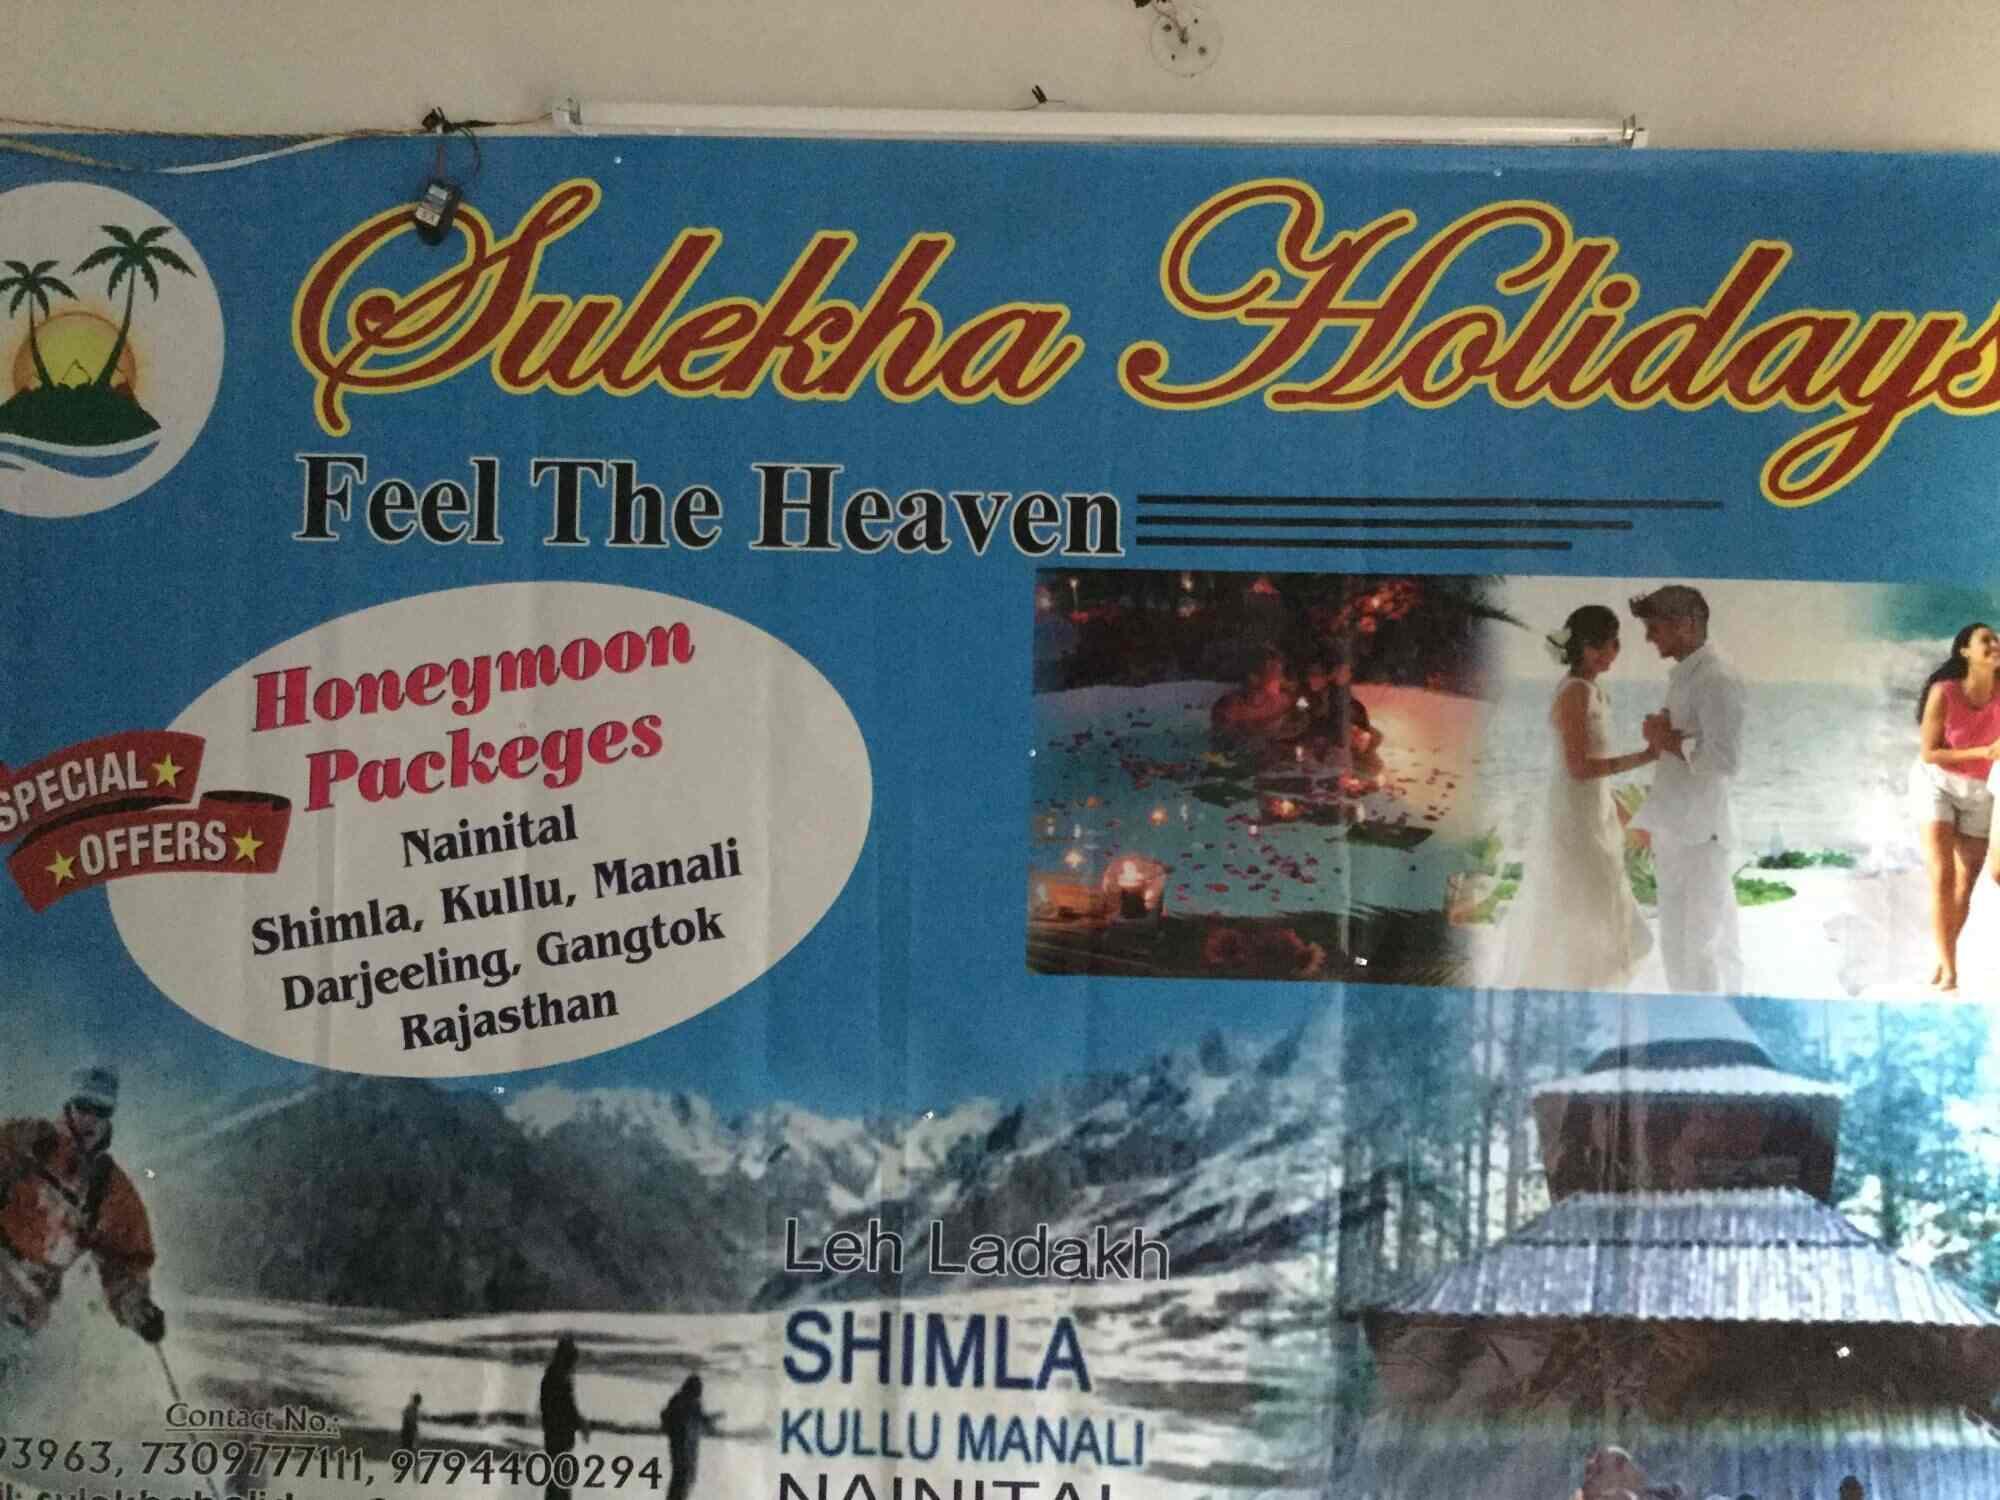 Sulekha Event Management, Kanpur Rd - Event Management